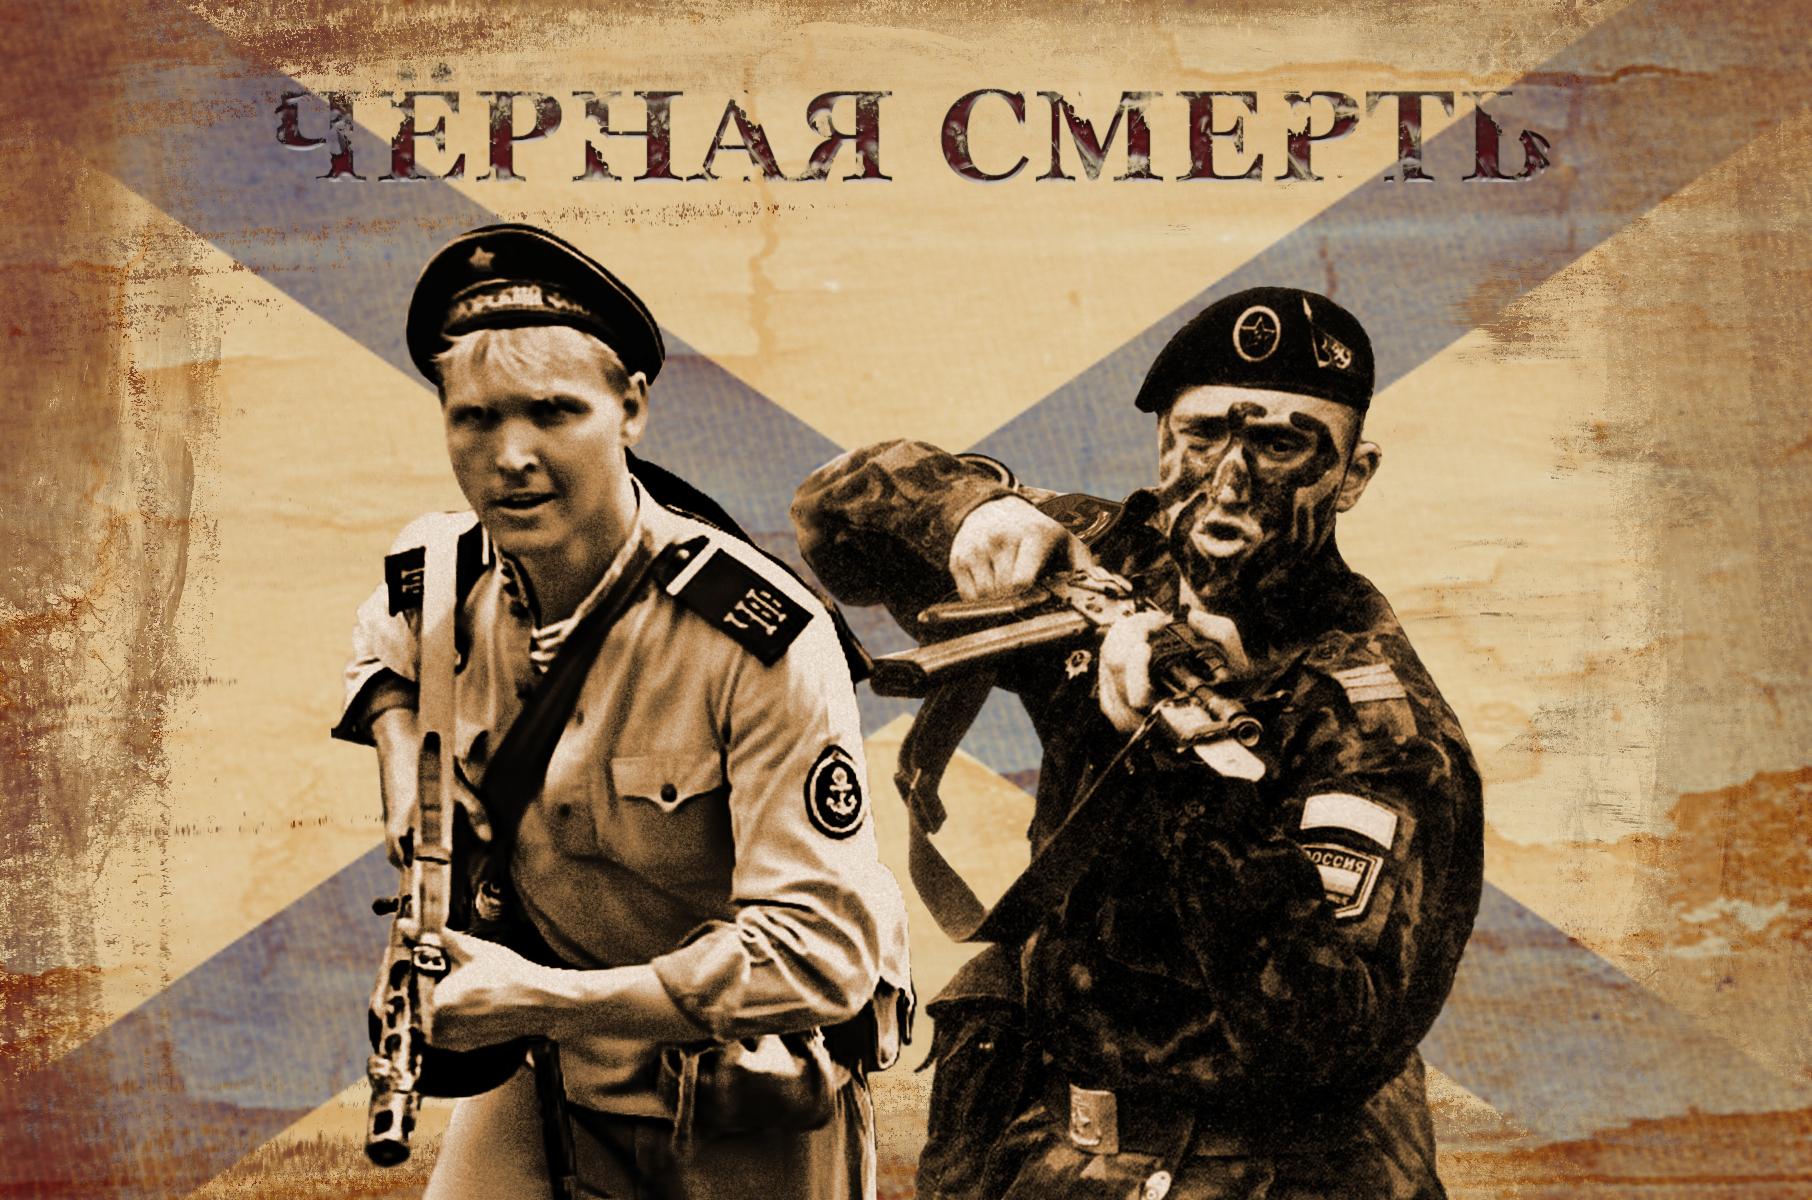 девиз морпехов россии